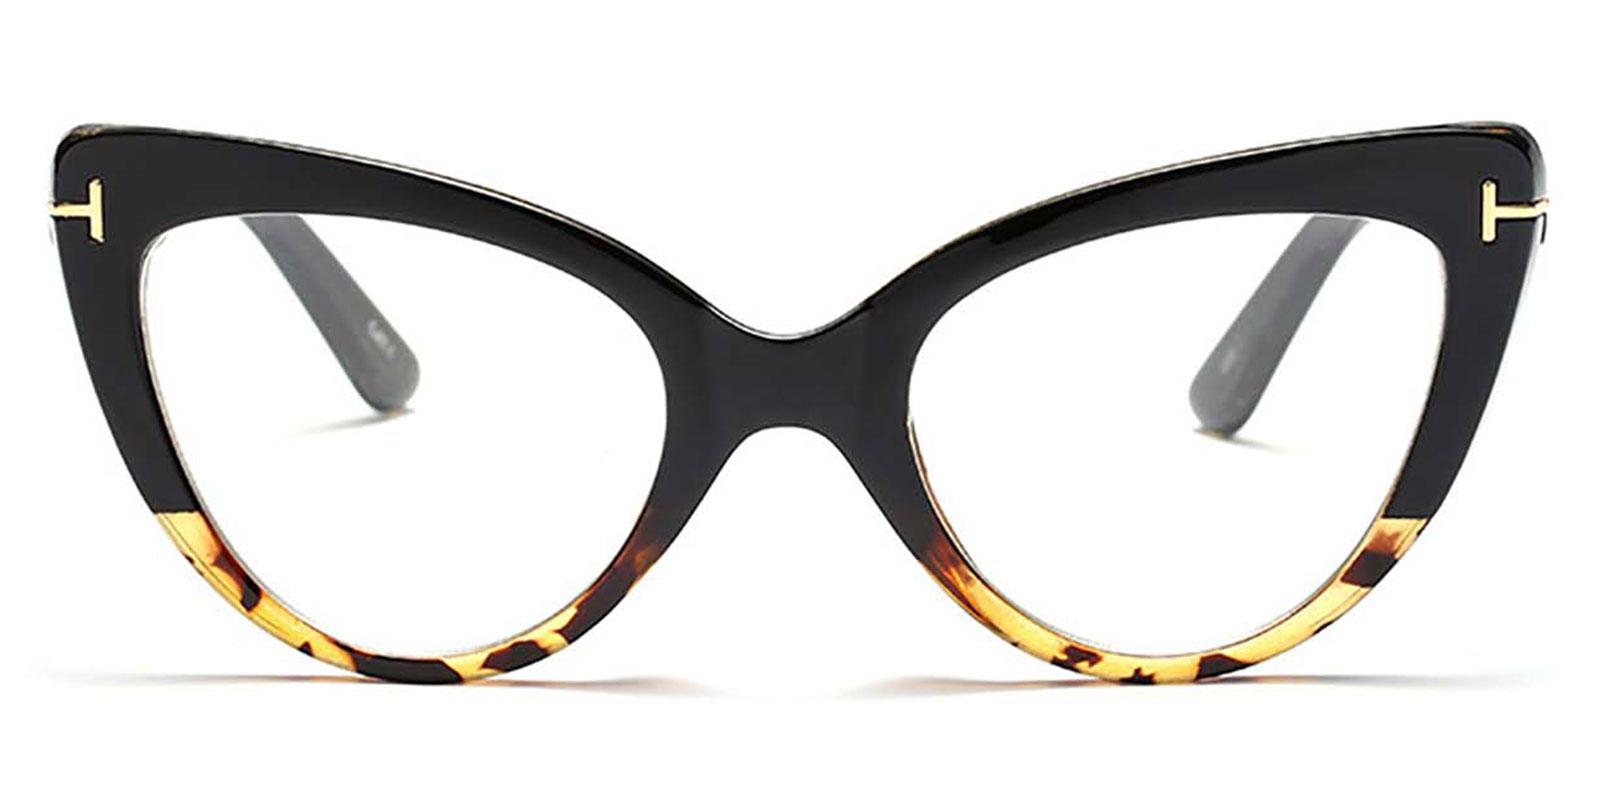 Abyssinia-Cat eye glasses with premium adjustable hinge